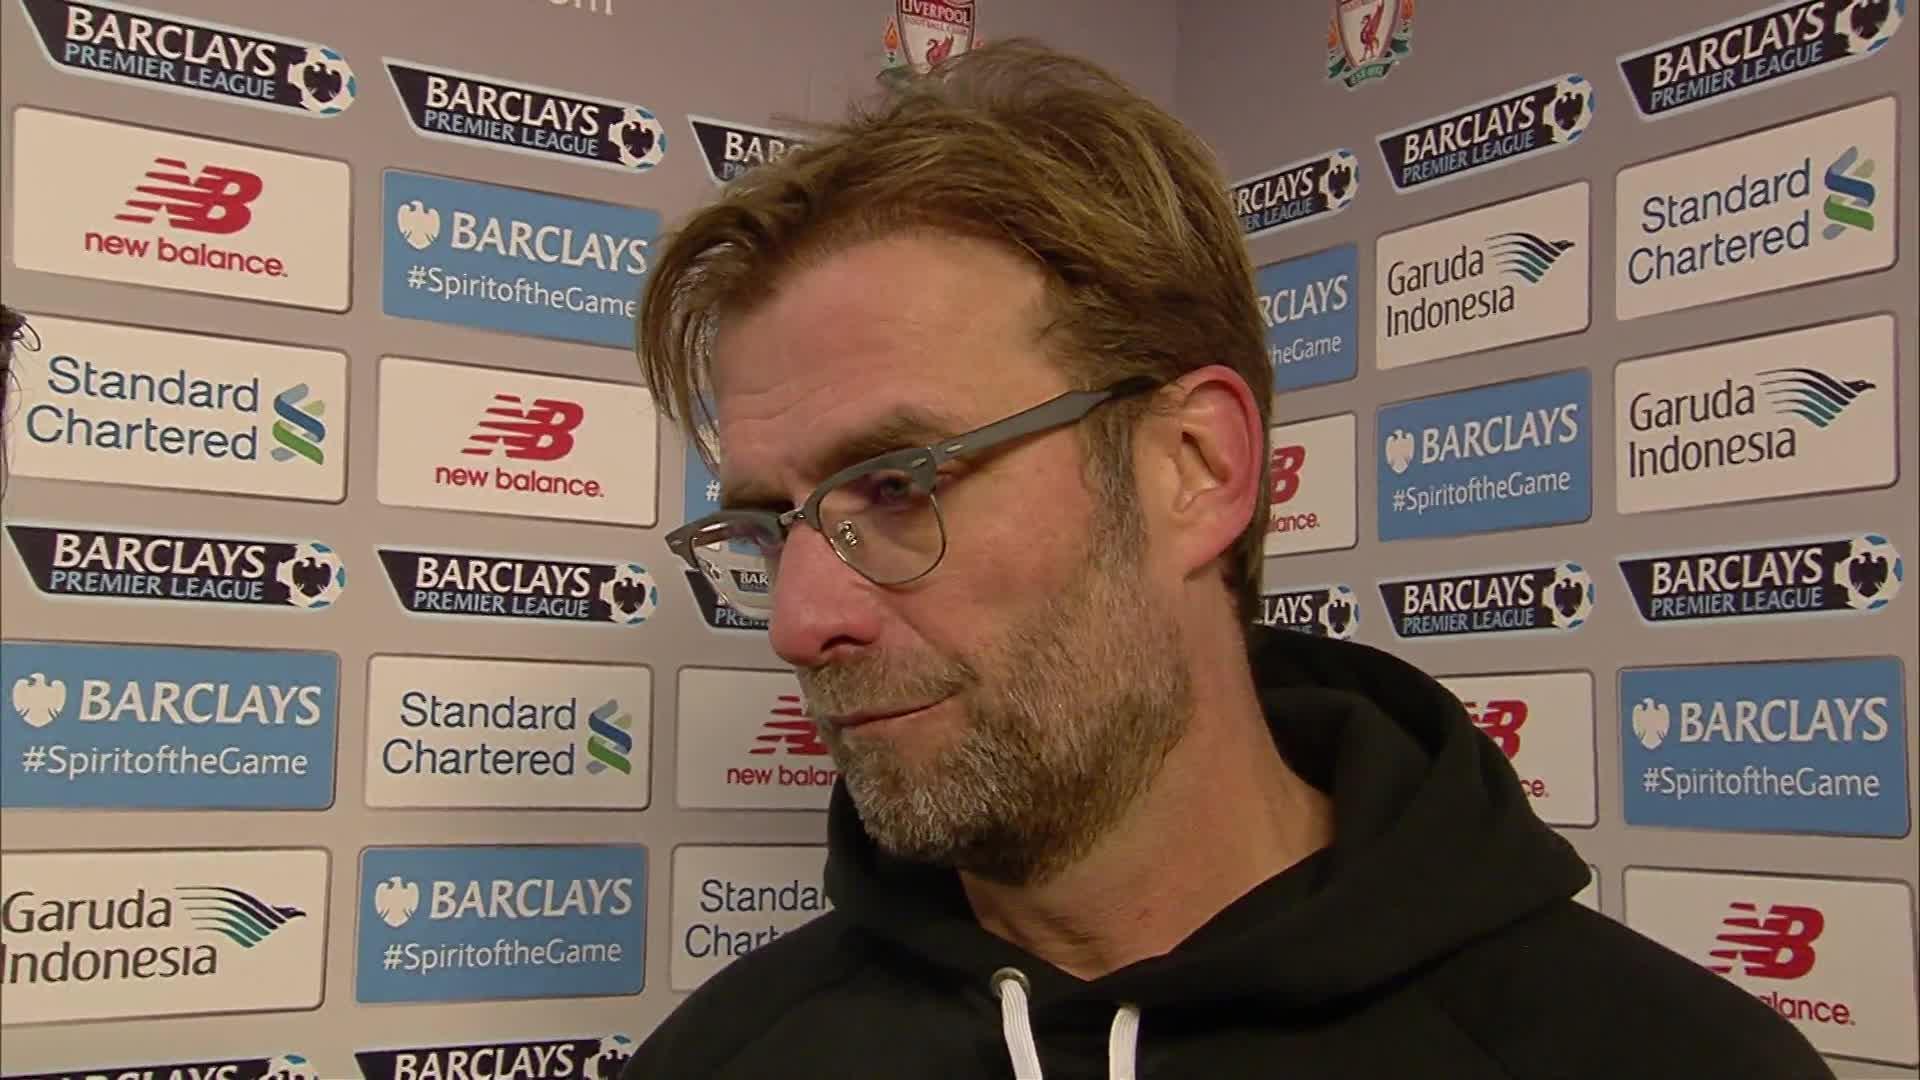 Klopp: 'We just need to keep winning games'